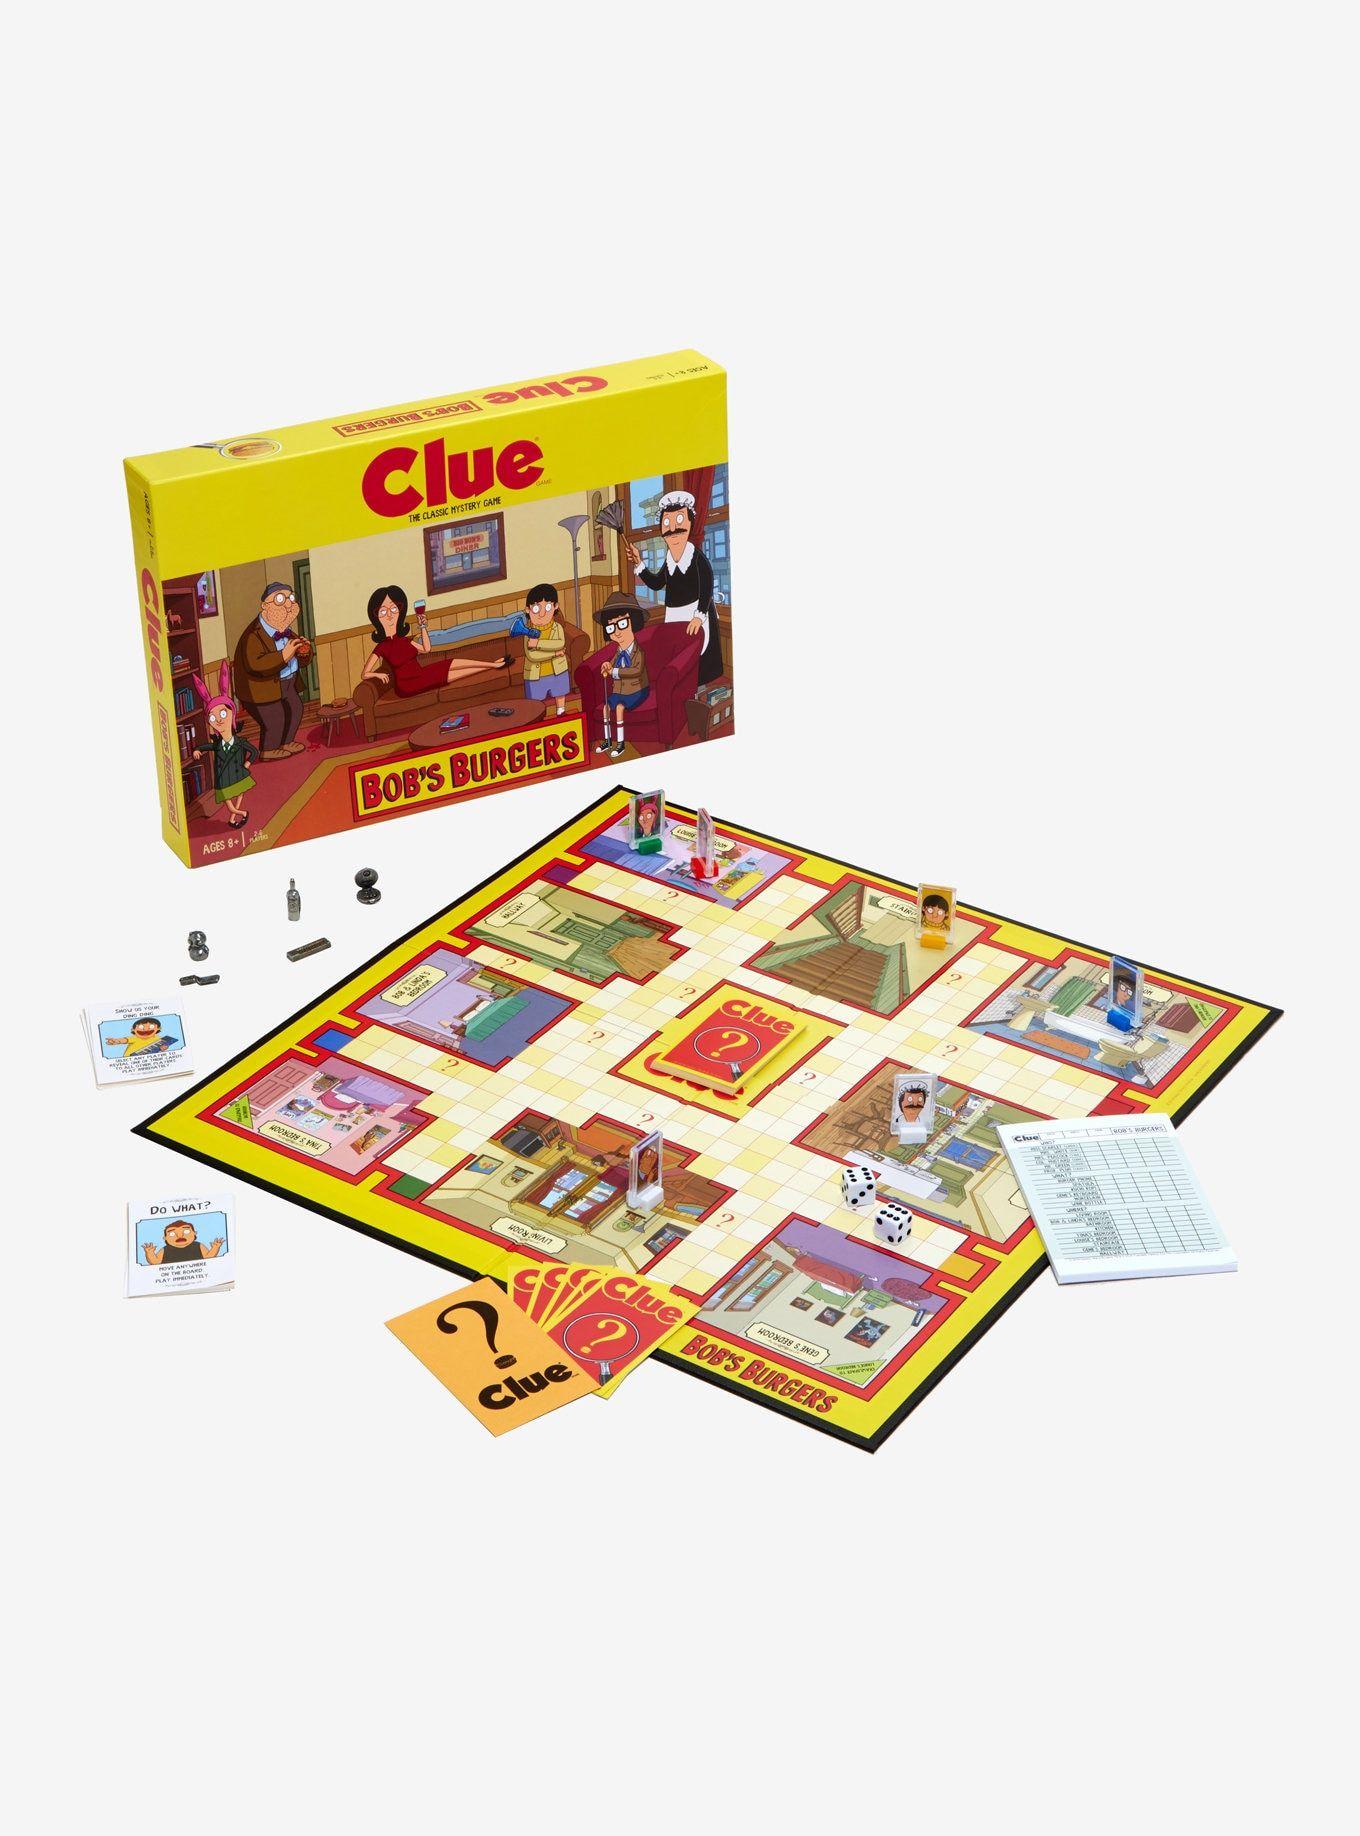 Bob's Burgers Clue Bobs burgers, Mystery games, Clue games